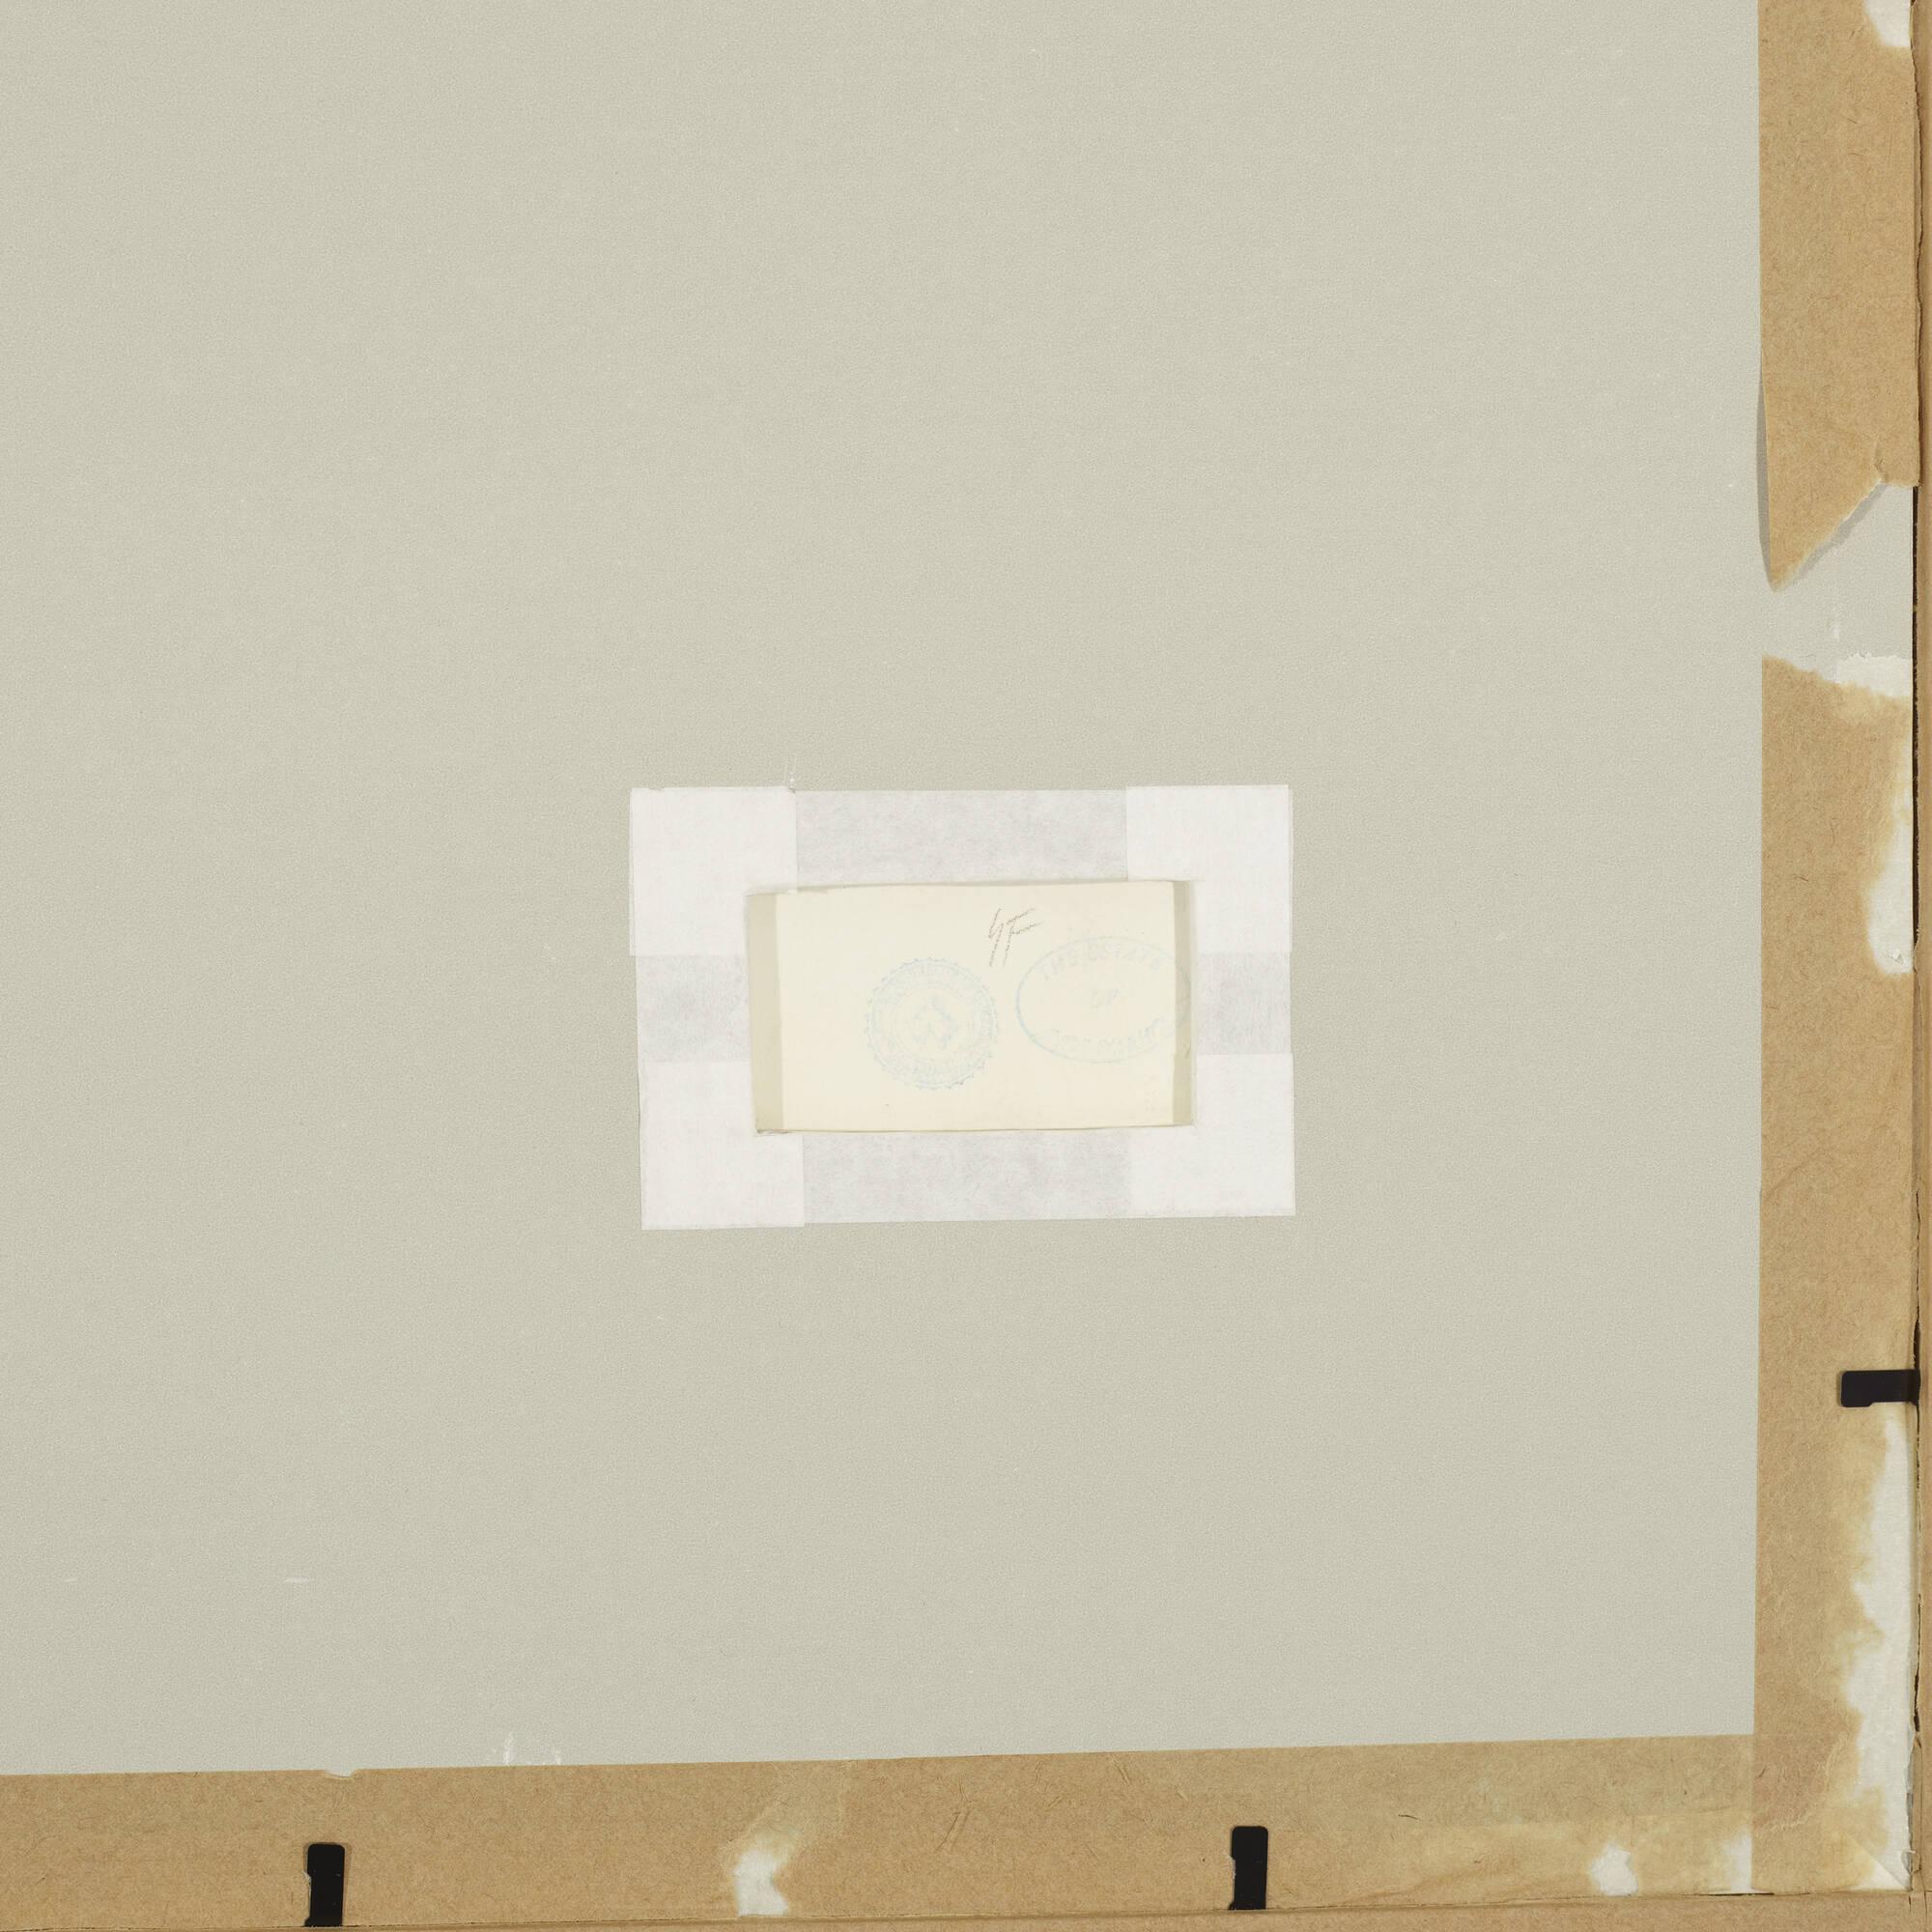 201: Andy Warhol / Untitled (Christmas Invitation Design) (2 of 2)